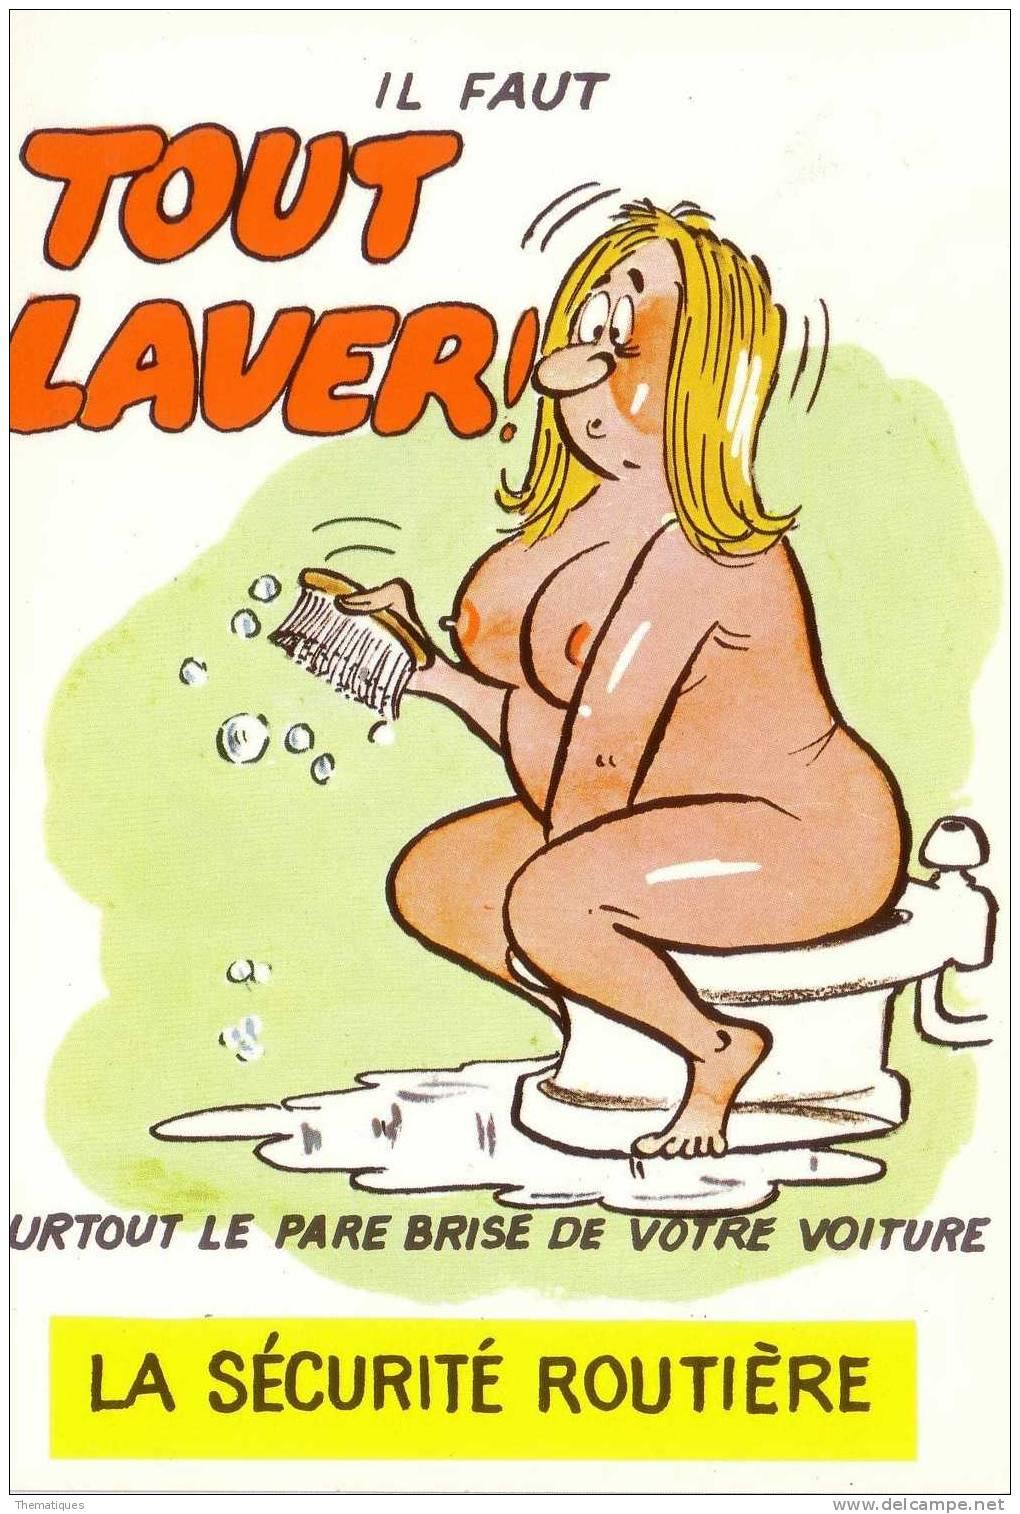 Thematiques Humour Serie Securite Routiere Reference 607/3  Editions Lyna  Carte Non Ecrite Qualite Ttb - Illustrateurs & Photographes